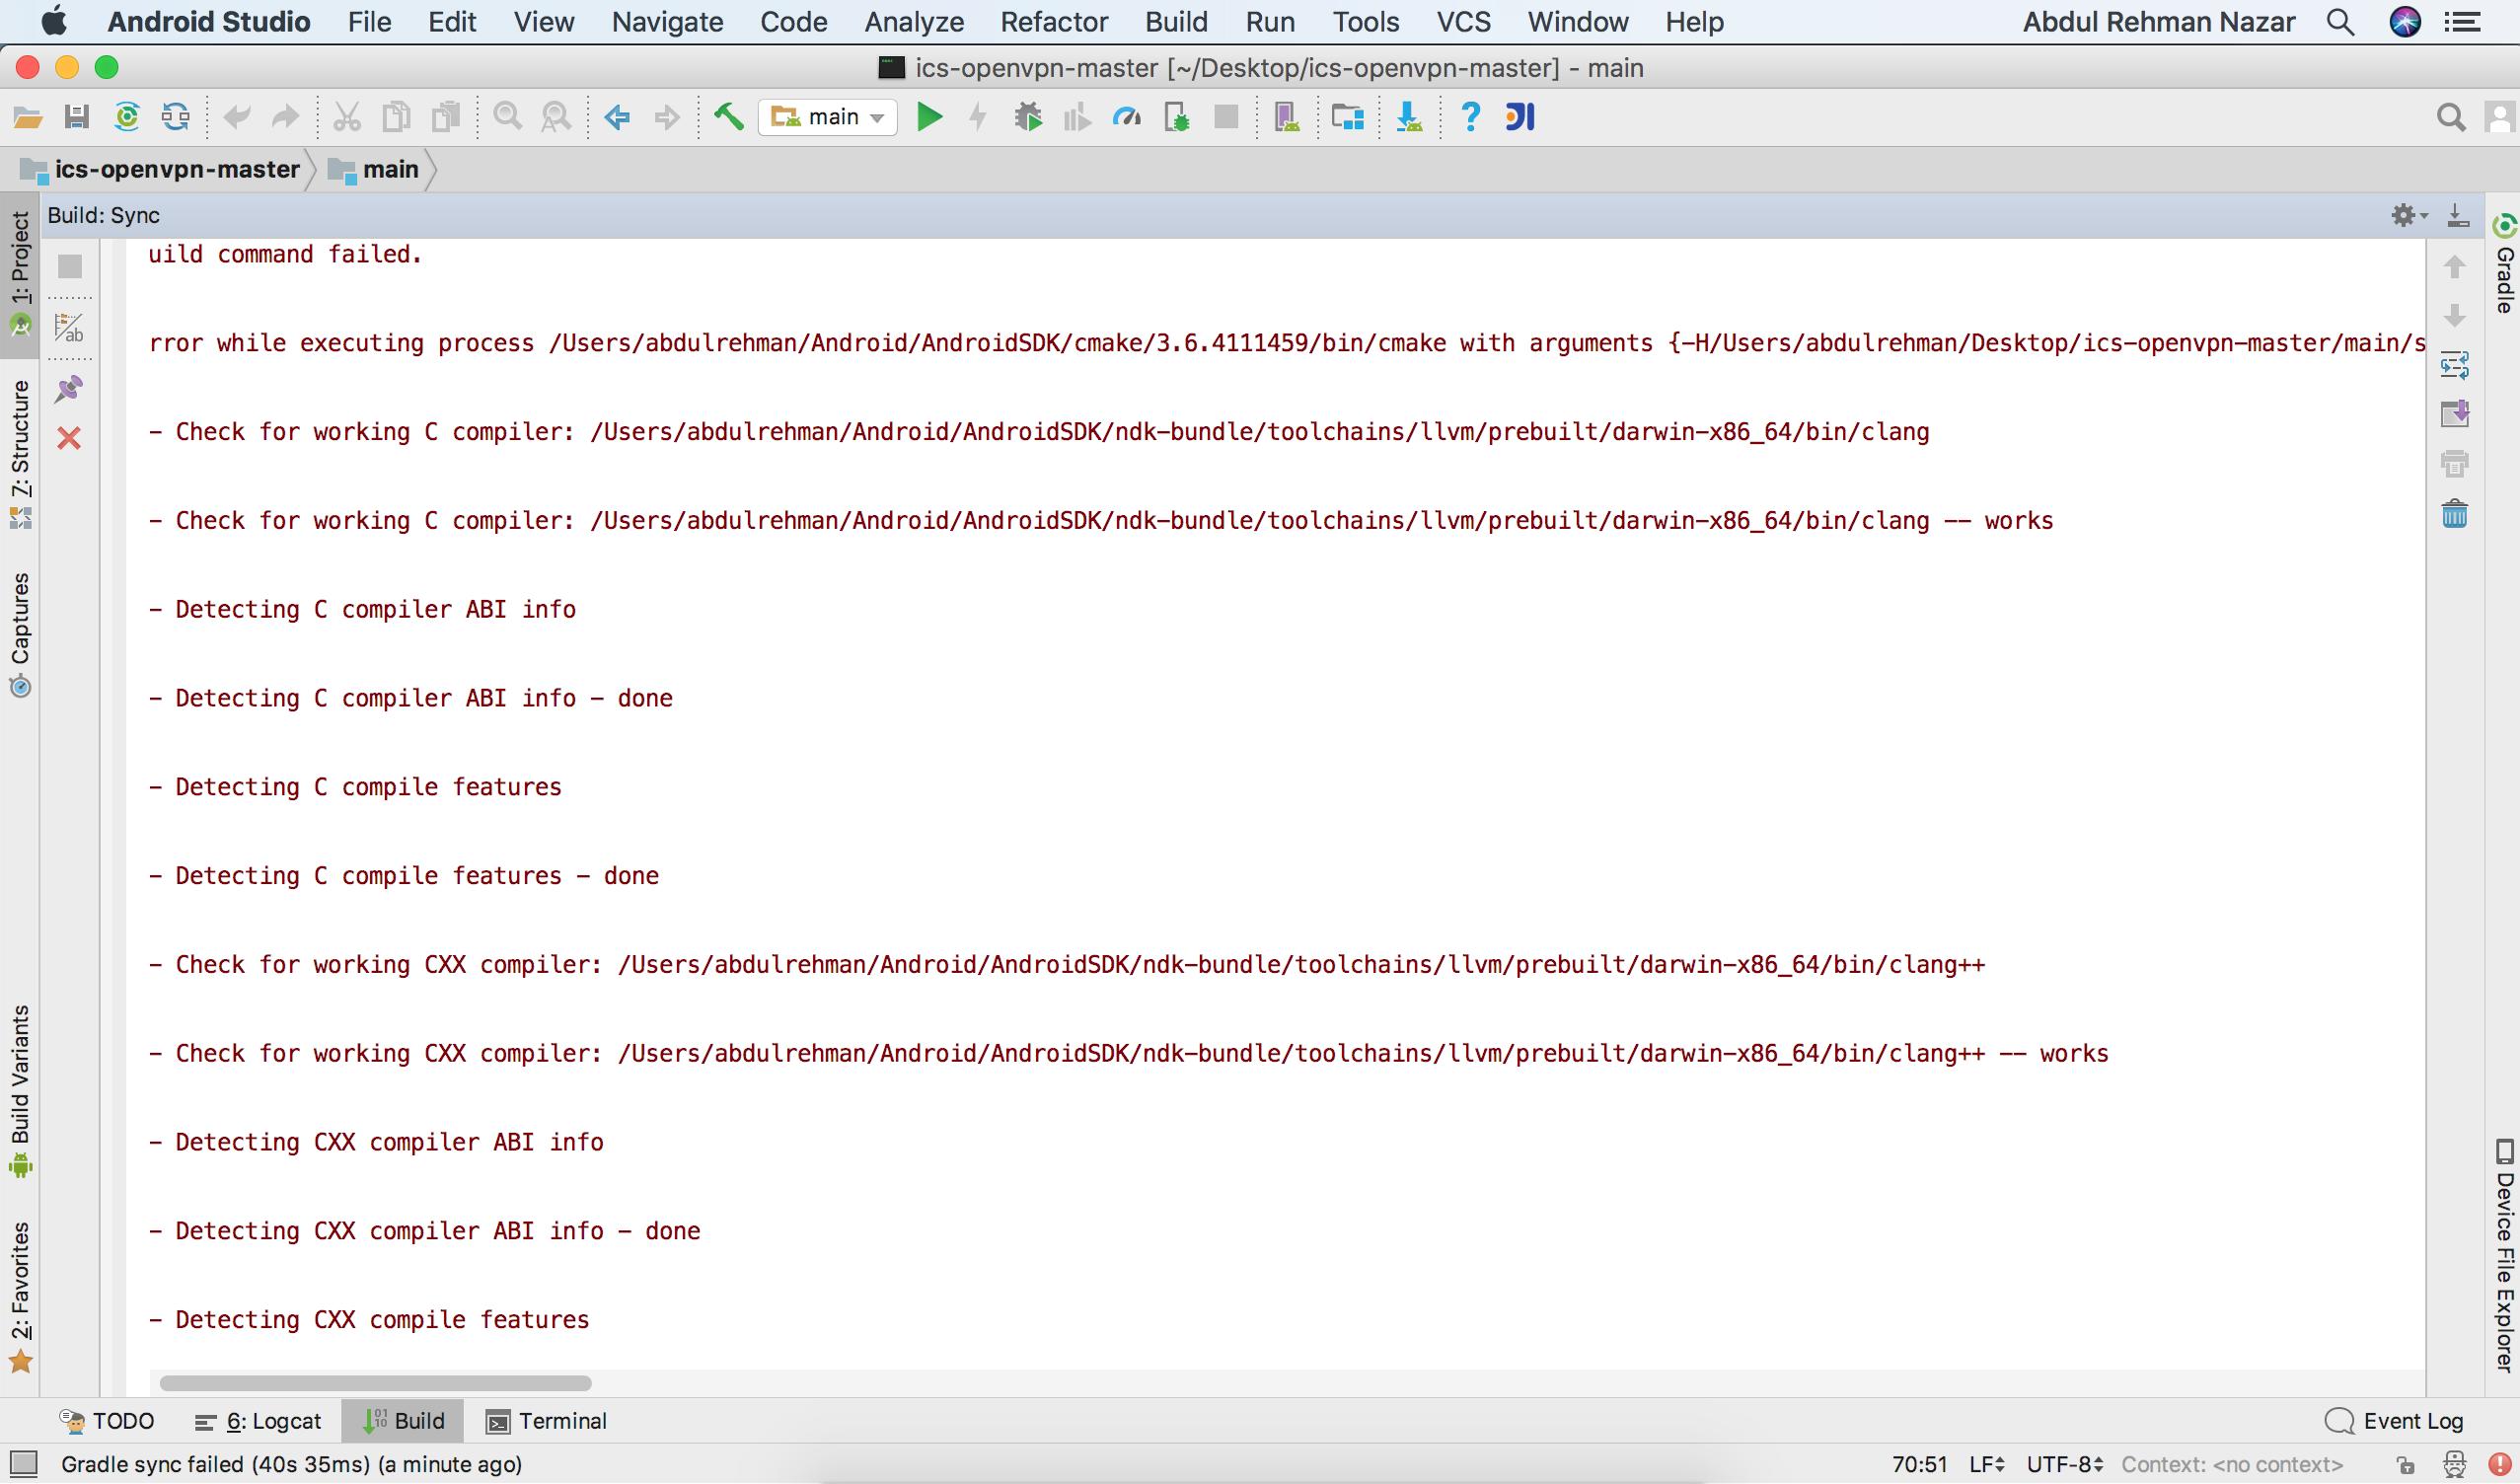 Build Command failed · Issue #932 · schwabe/ics-openvpn · GitHub